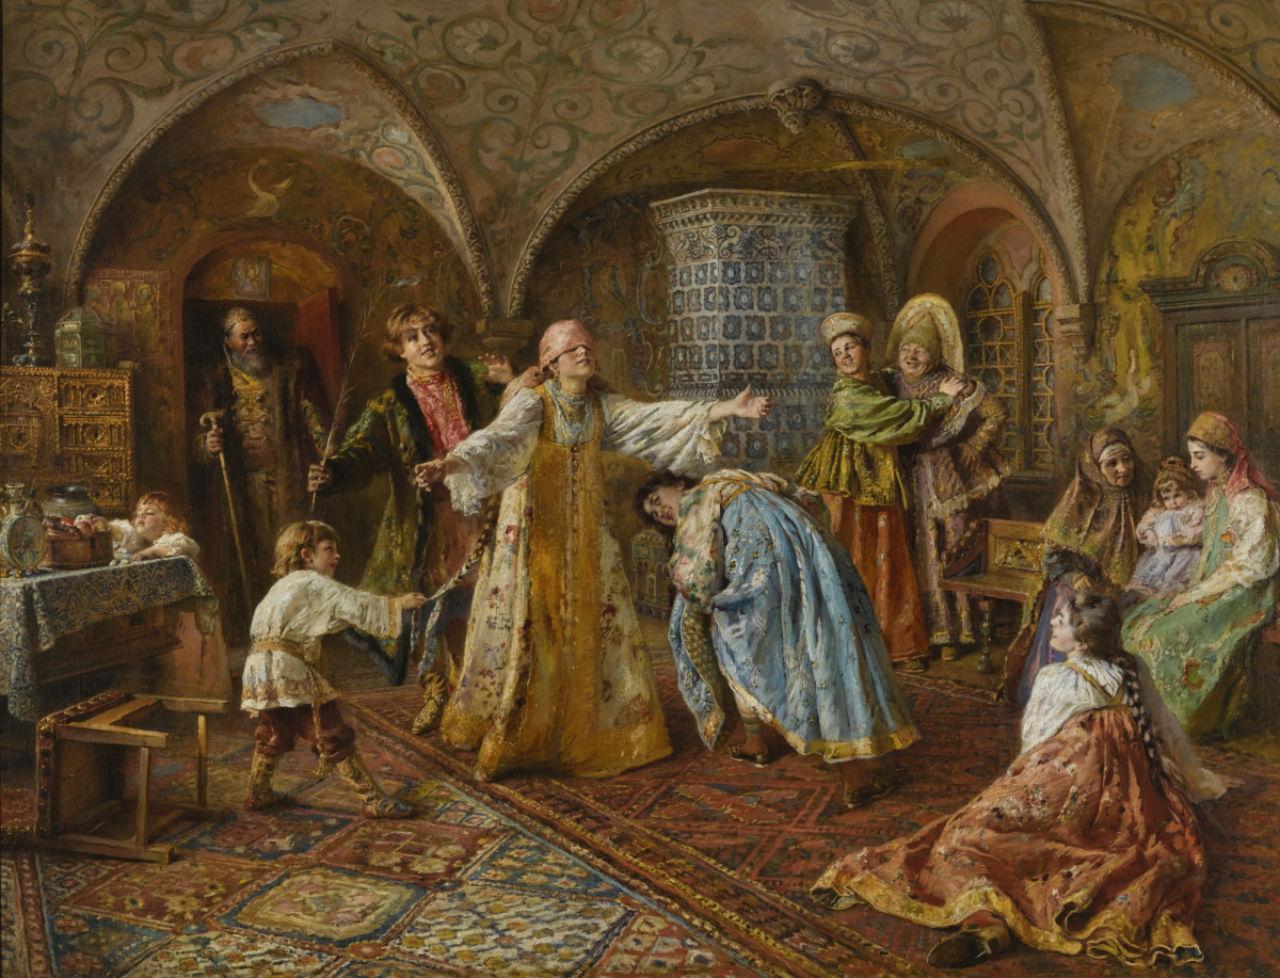 3-Константин Егорович Маковский - Игра в жмурки - 1890-е.jpg